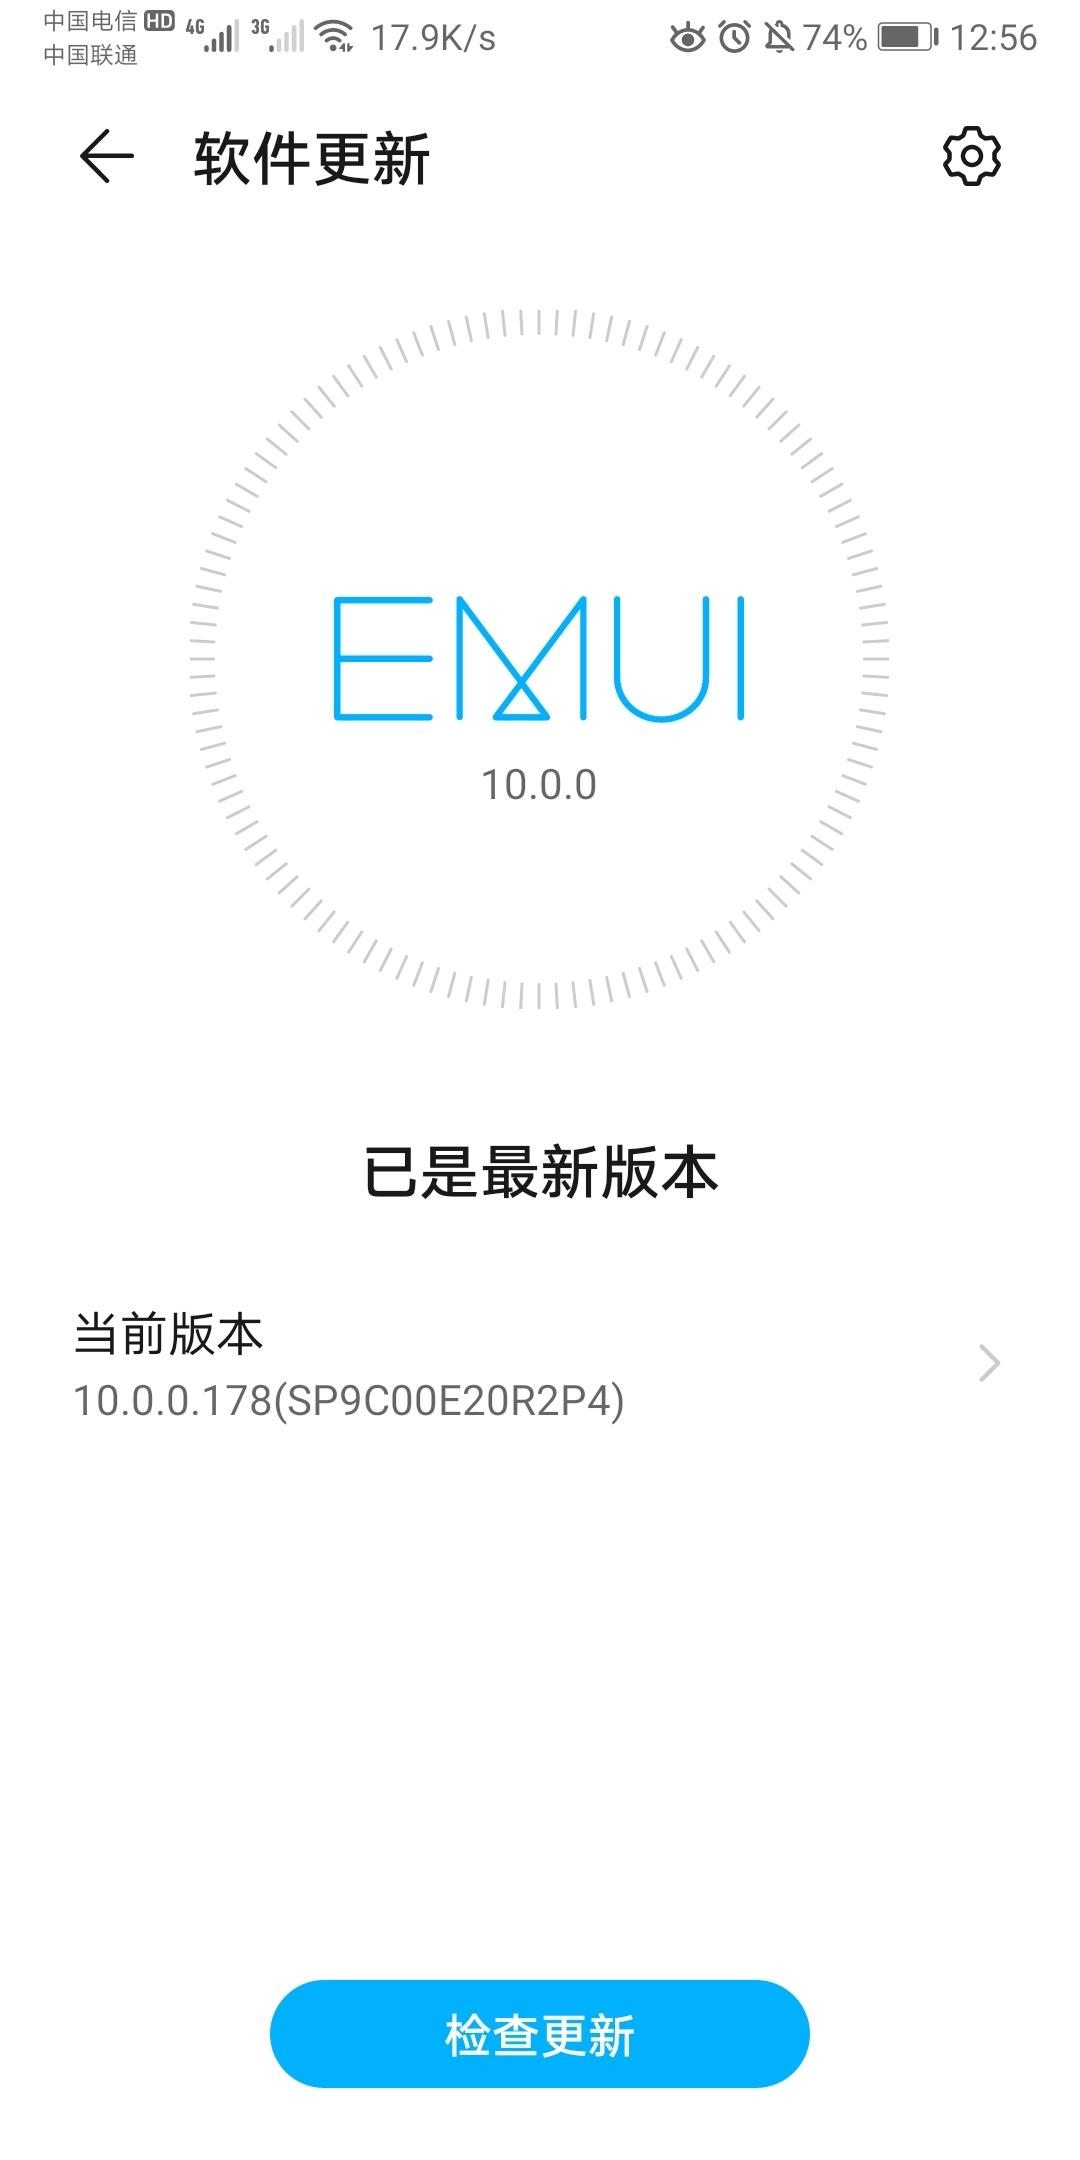 Screenshot_20200602_125632_com.huawei.android.hwouc.jpg